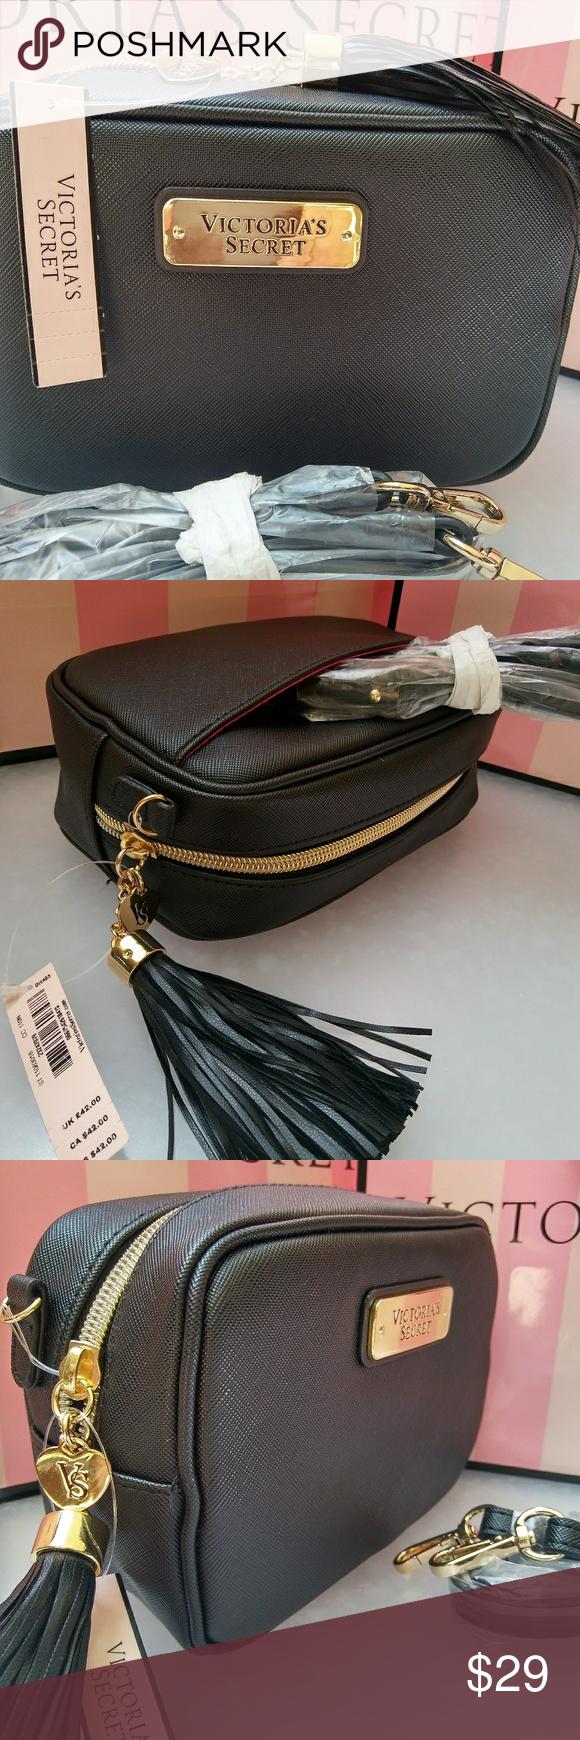 51d6be5a98b9 VS VICTORIA SECRET MINI CROSSBODY BAG Tassel NEW WITH TAGS. Super cute mini  crossbody bag   tassel . Black color. 7